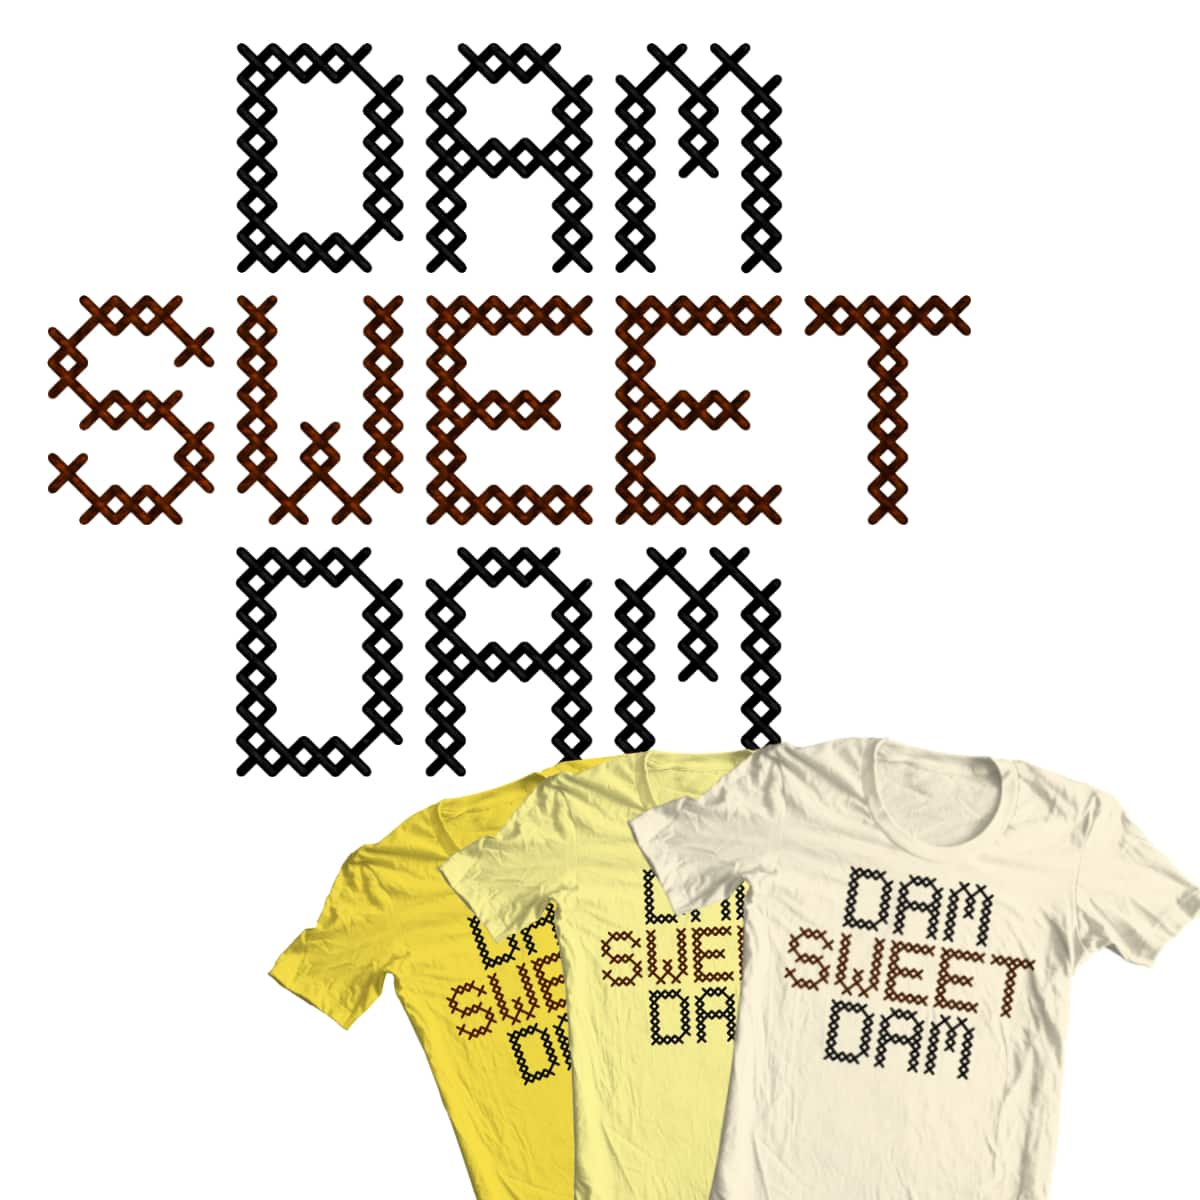 Dam Sweet Dam by Cheezeburger on Threadless